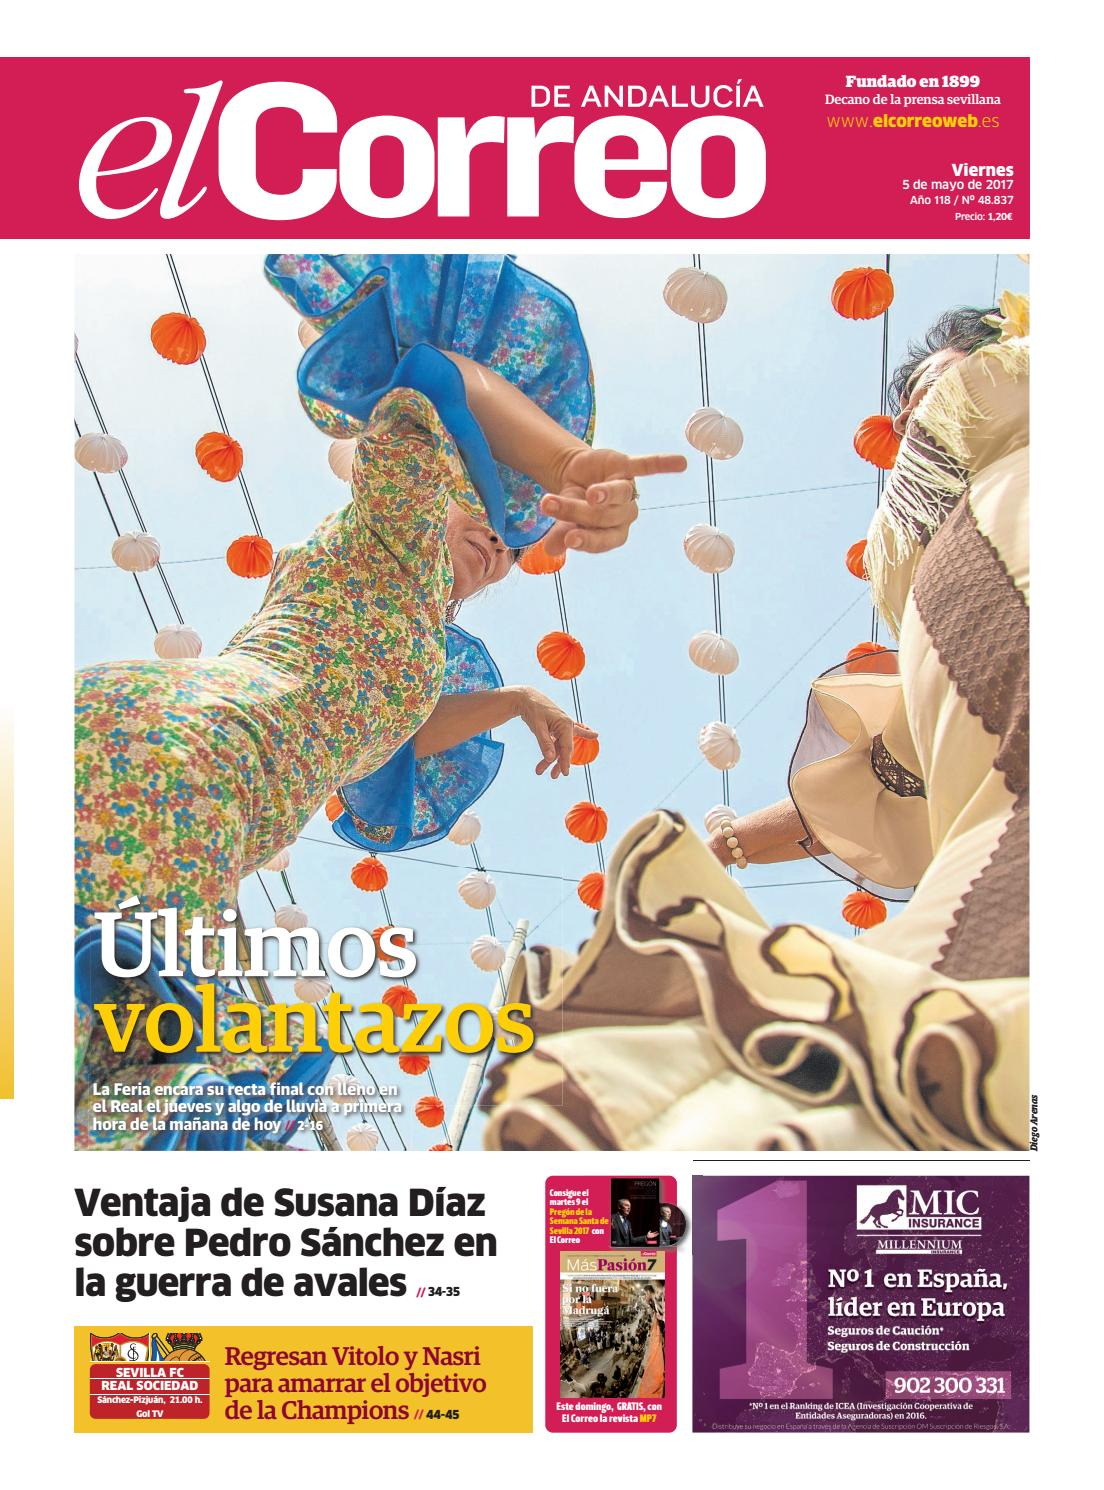 Muebles Rey Lezo Horario - 05 05 2017 El Correo De Andaluc A By El Correo De Andaluc A S L [mjhdah]http://ideasdecoracion.mundomueble.es/wp-content/uploads/2015/01/blog3-01.jpg